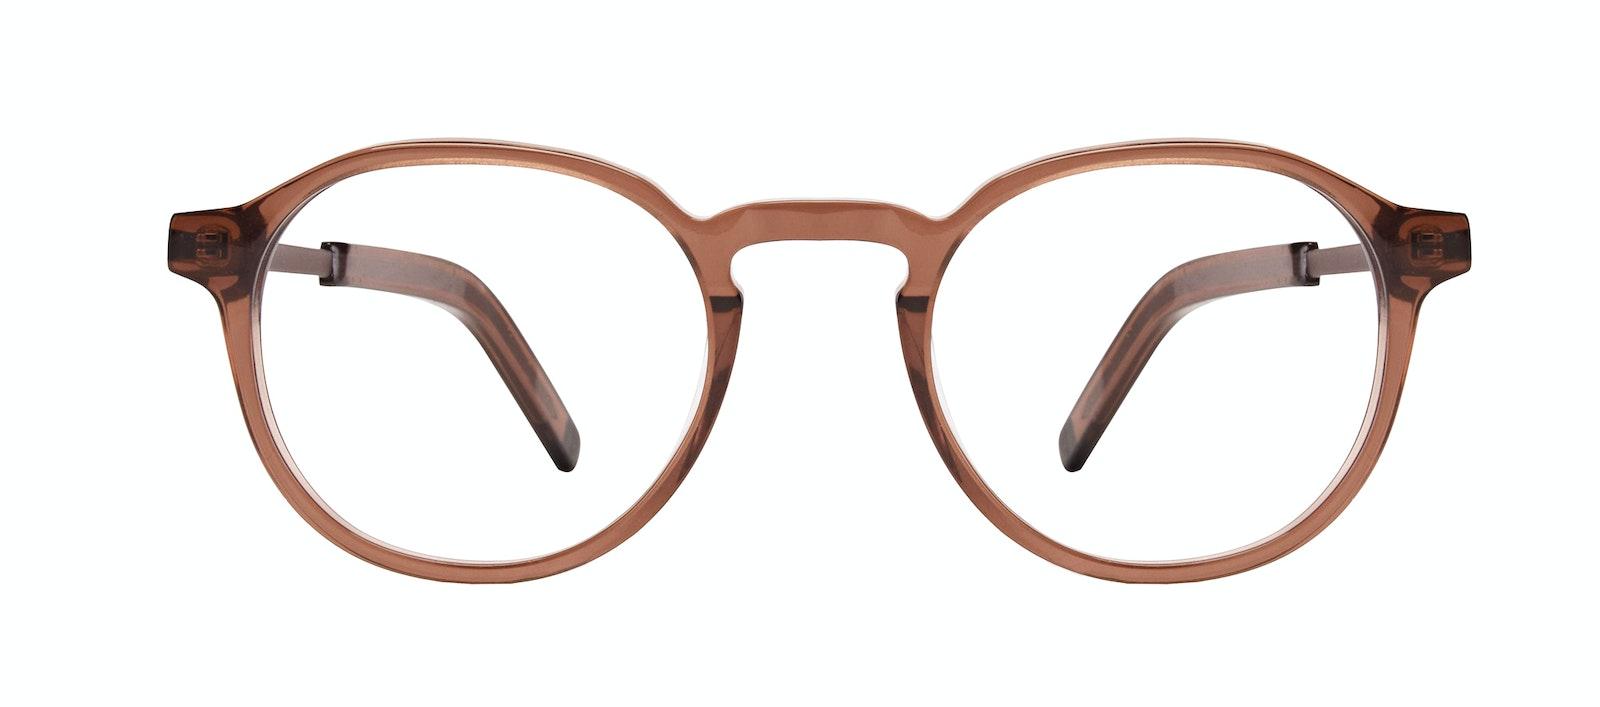 Affordable Fashion Glasses Round Eyeglasses Men Prime XL Terra Front